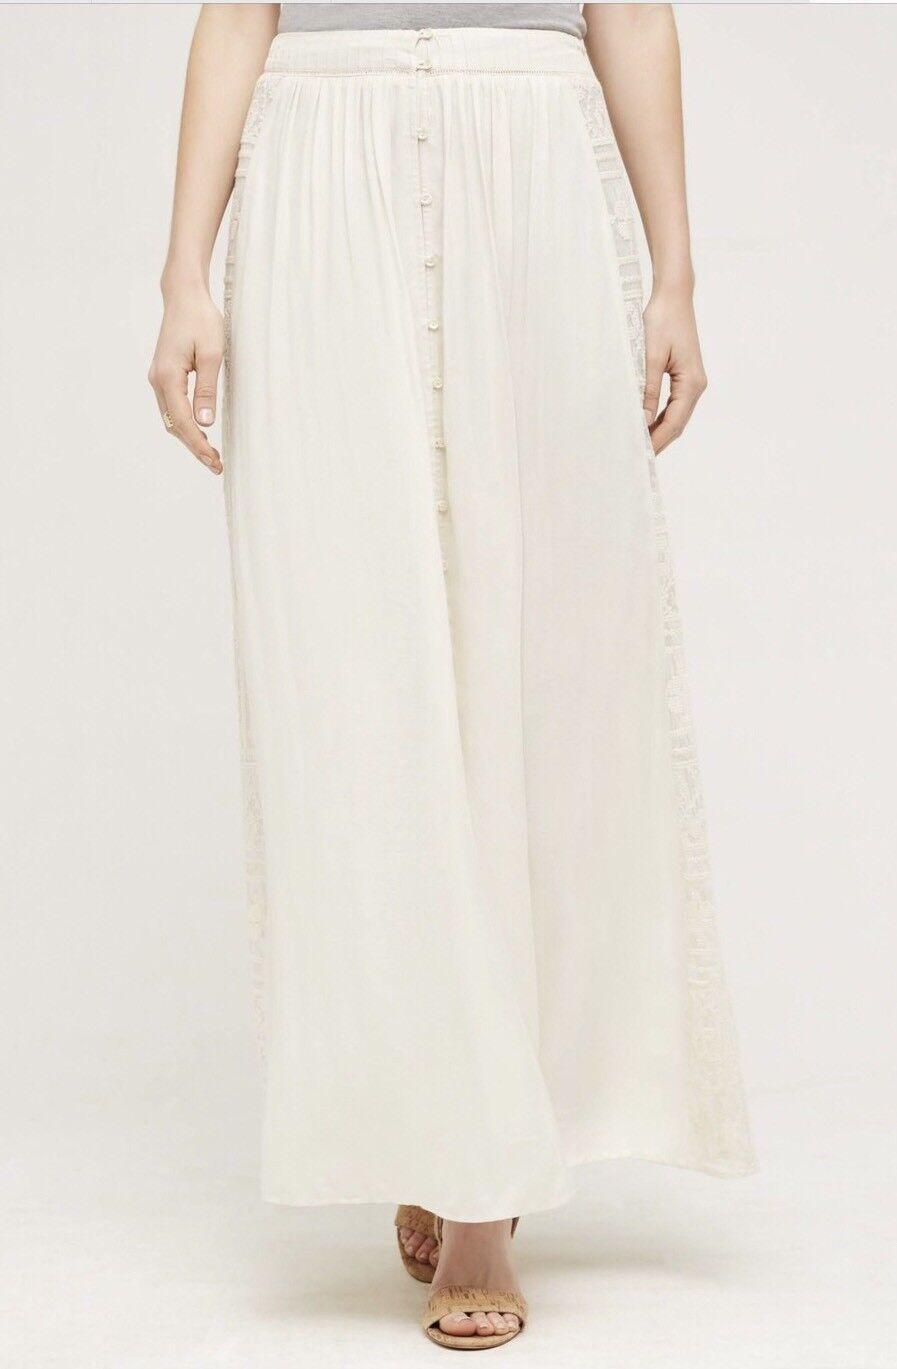 NEW Anthropologie RannaGill Ivory Depurpleh Maxi Skirt Size XS Button Front